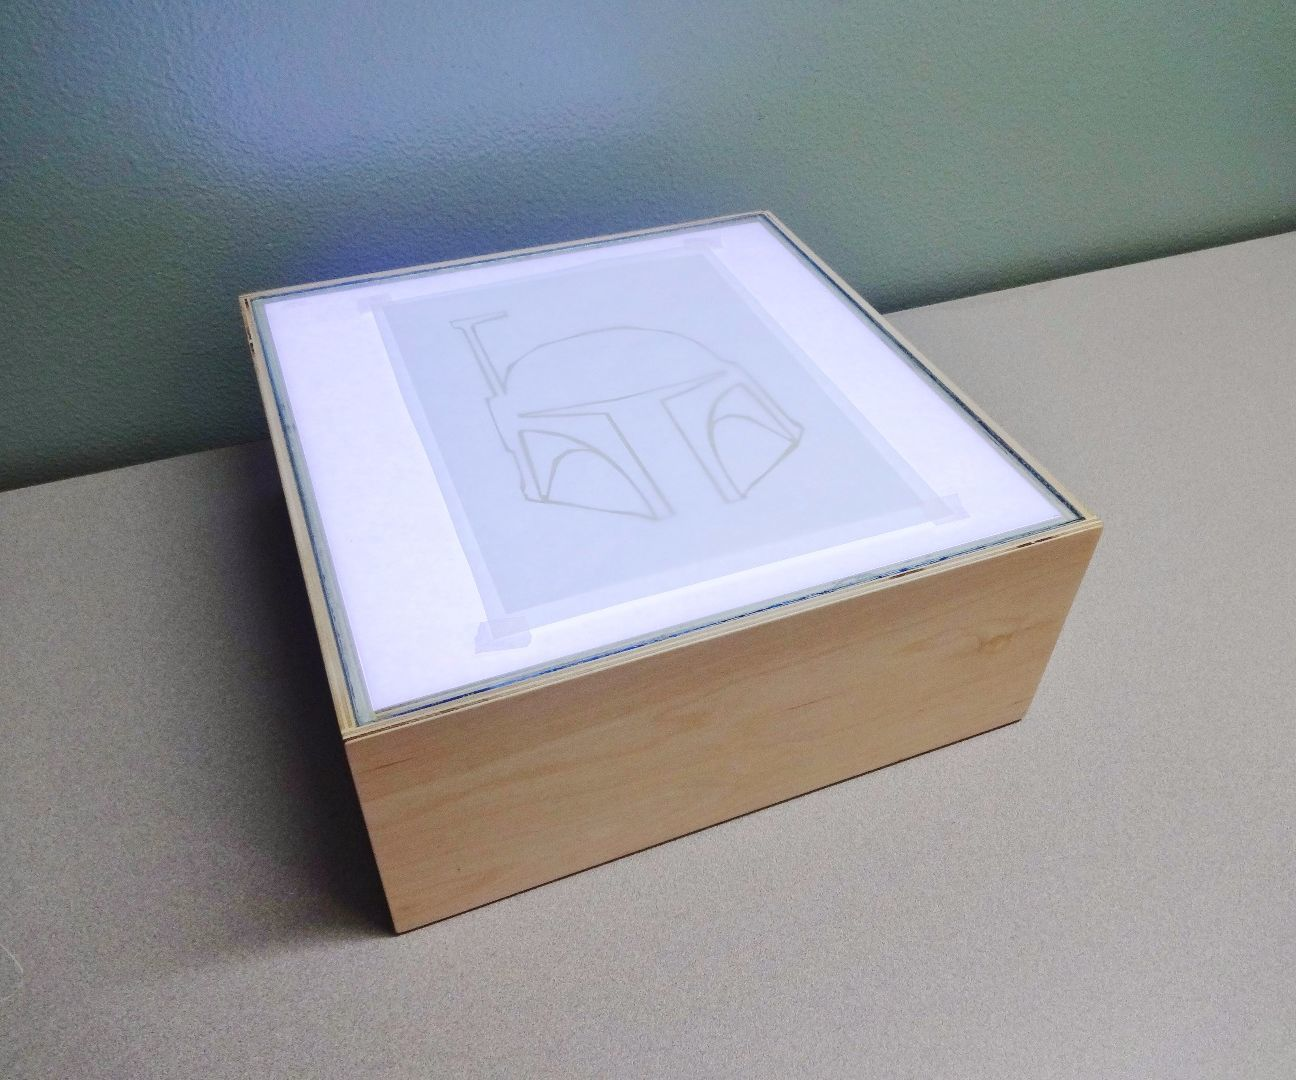 How to make an LED light box